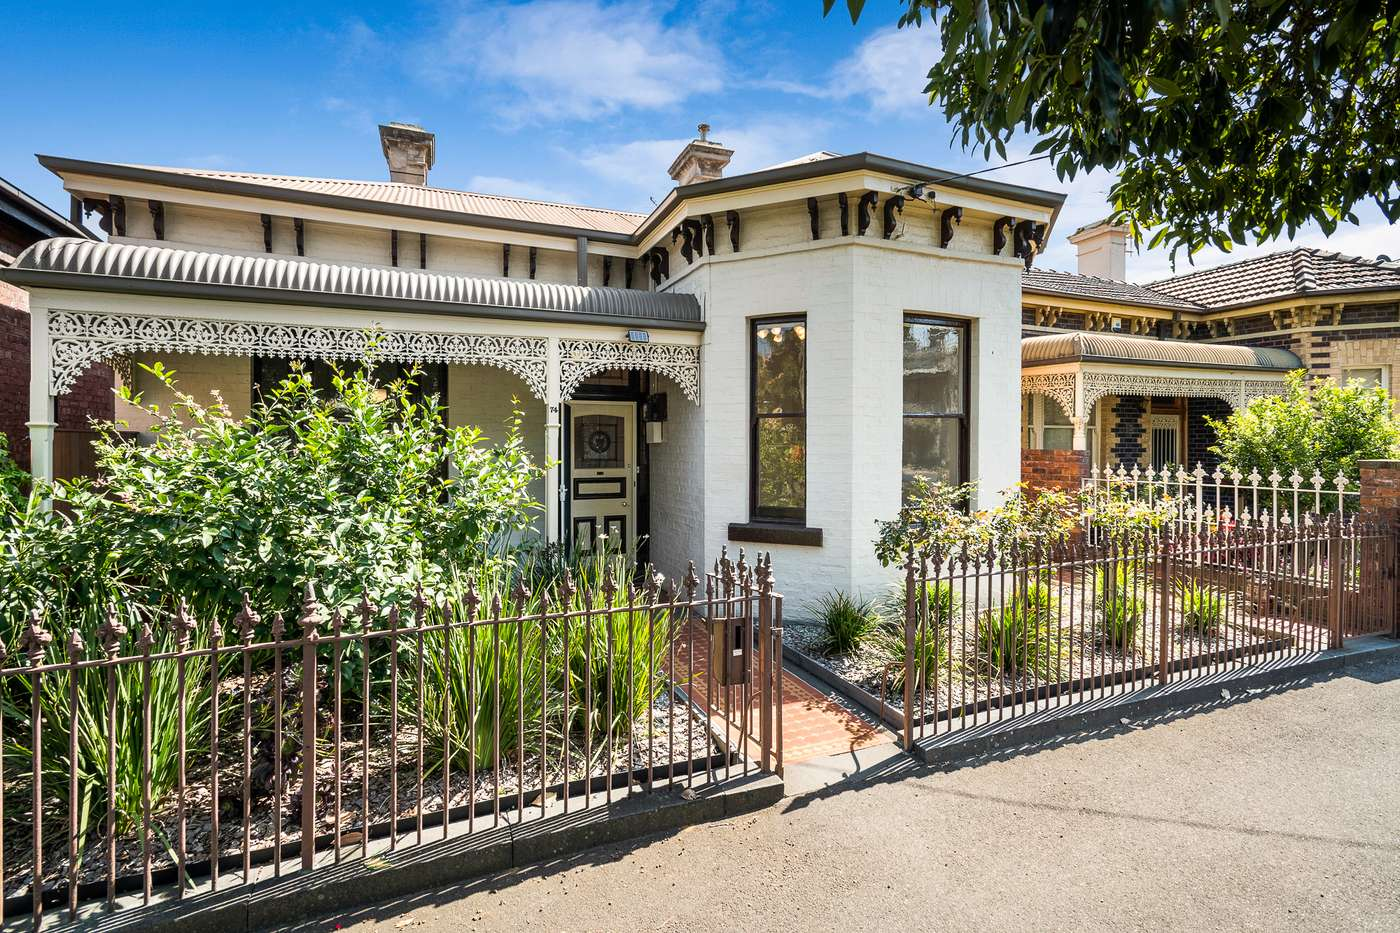 Main view of Homely house listing, 74 Merton Street, Albert Park, VIC 3206